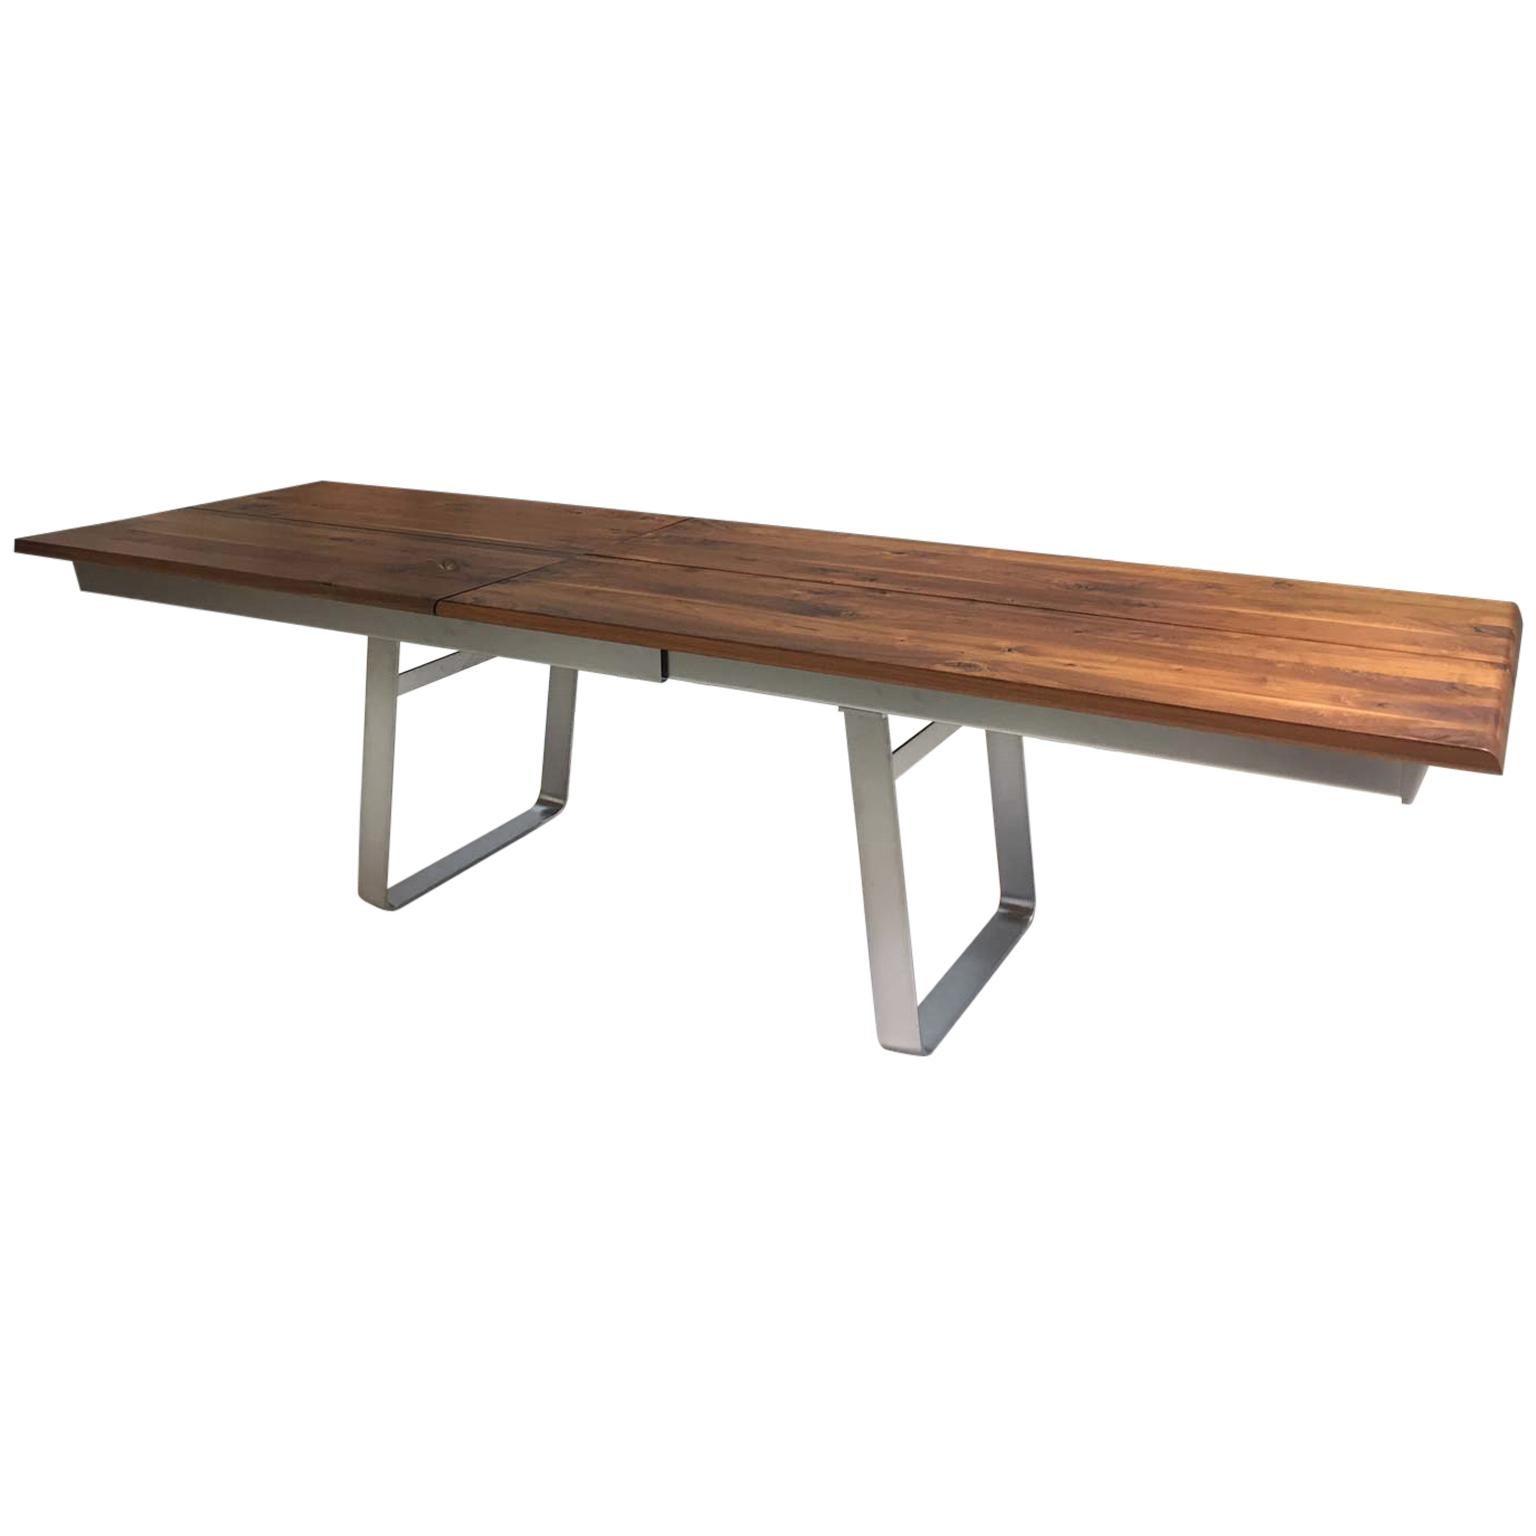 Solid Wild Walnut Wood Extending table Matt Chrome Skid Base